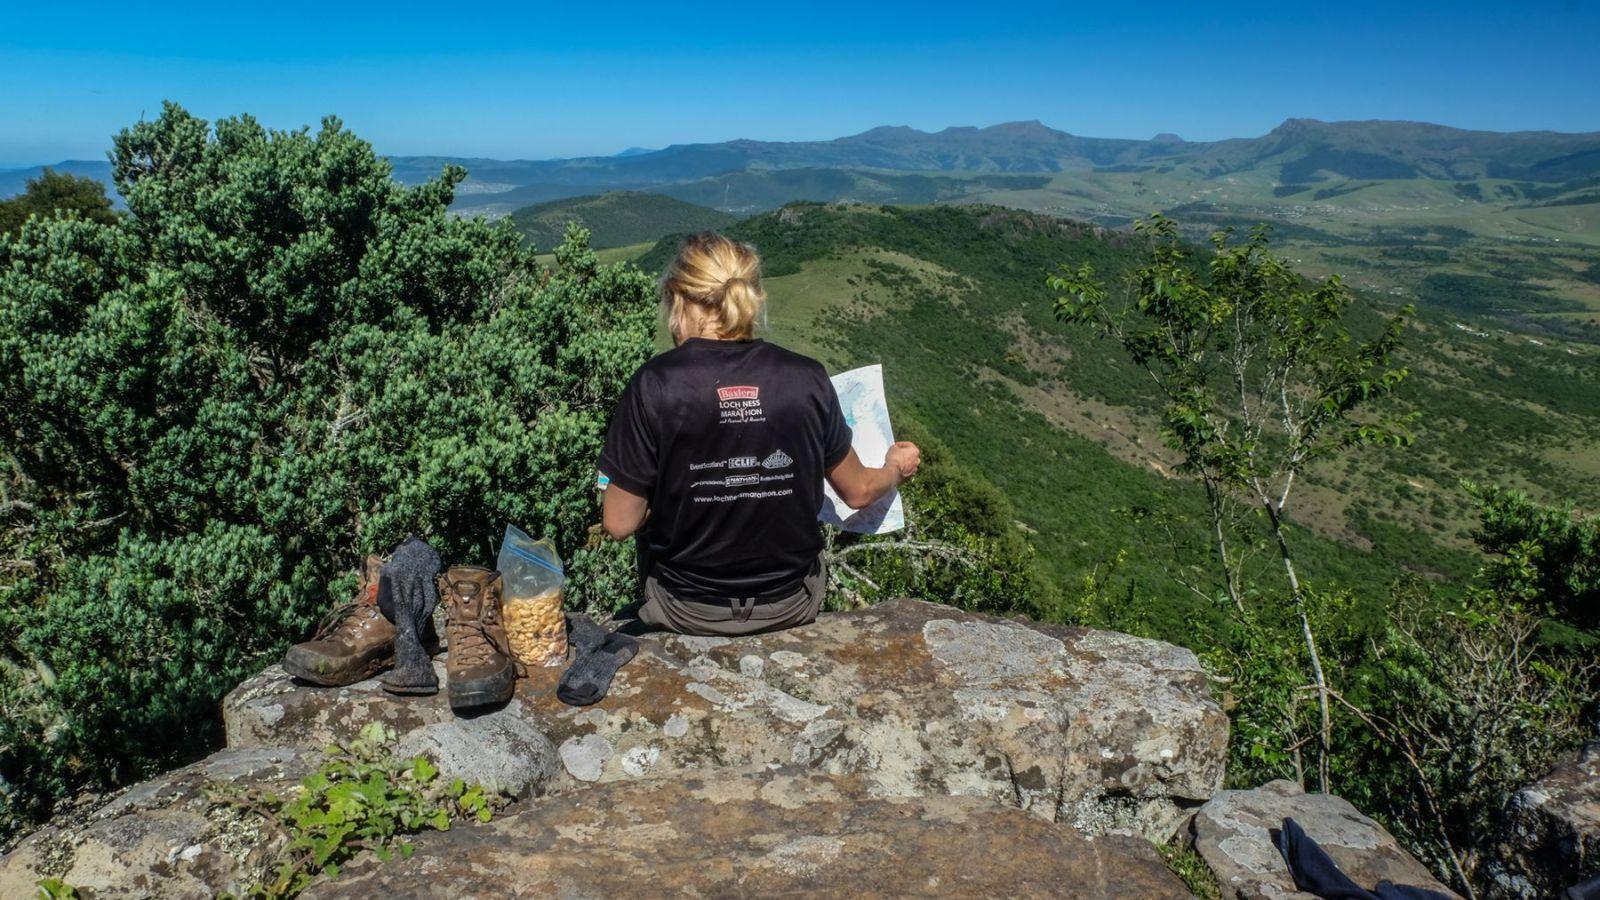 a photo of a hiker reading the map on the amathole hiking trail.